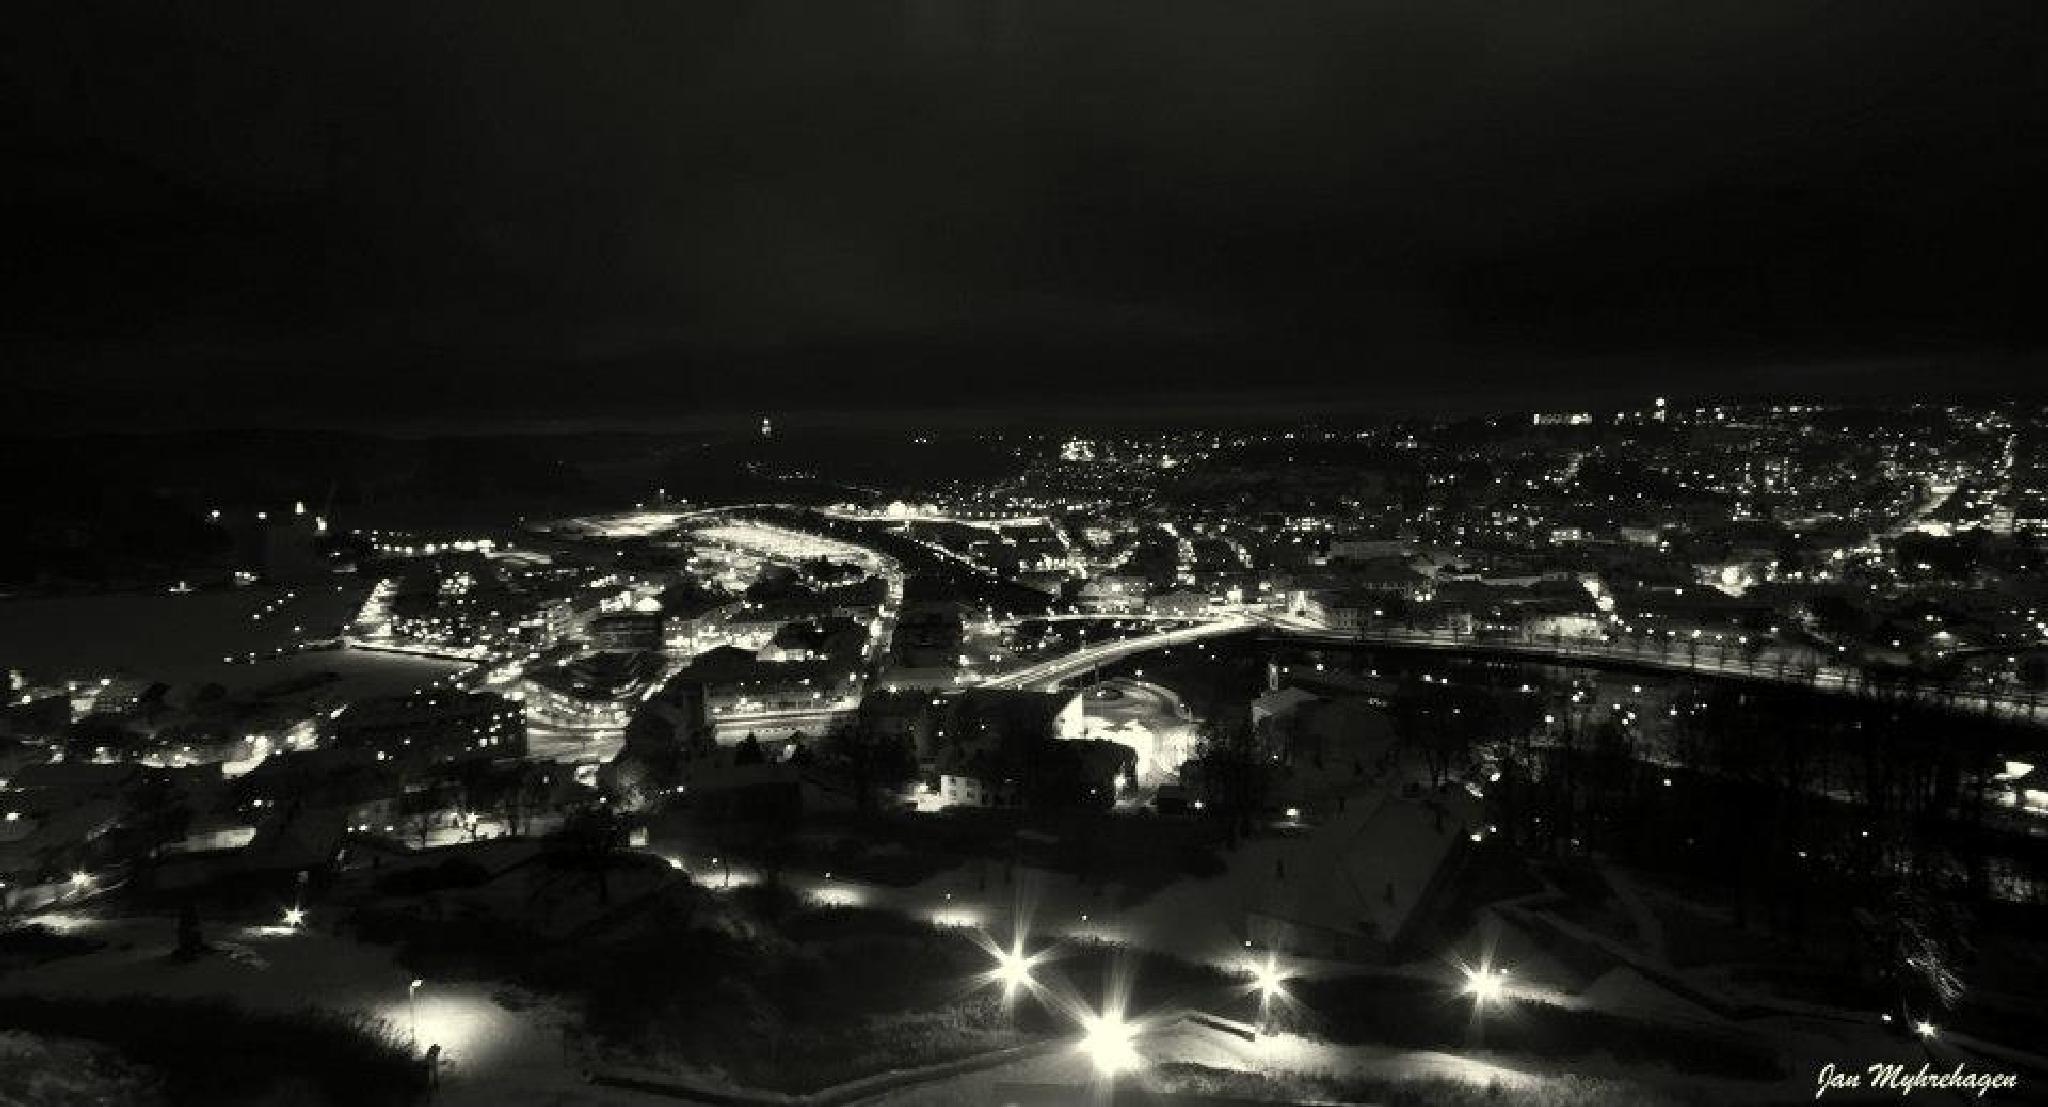 Halden City by night by Myhrehagen